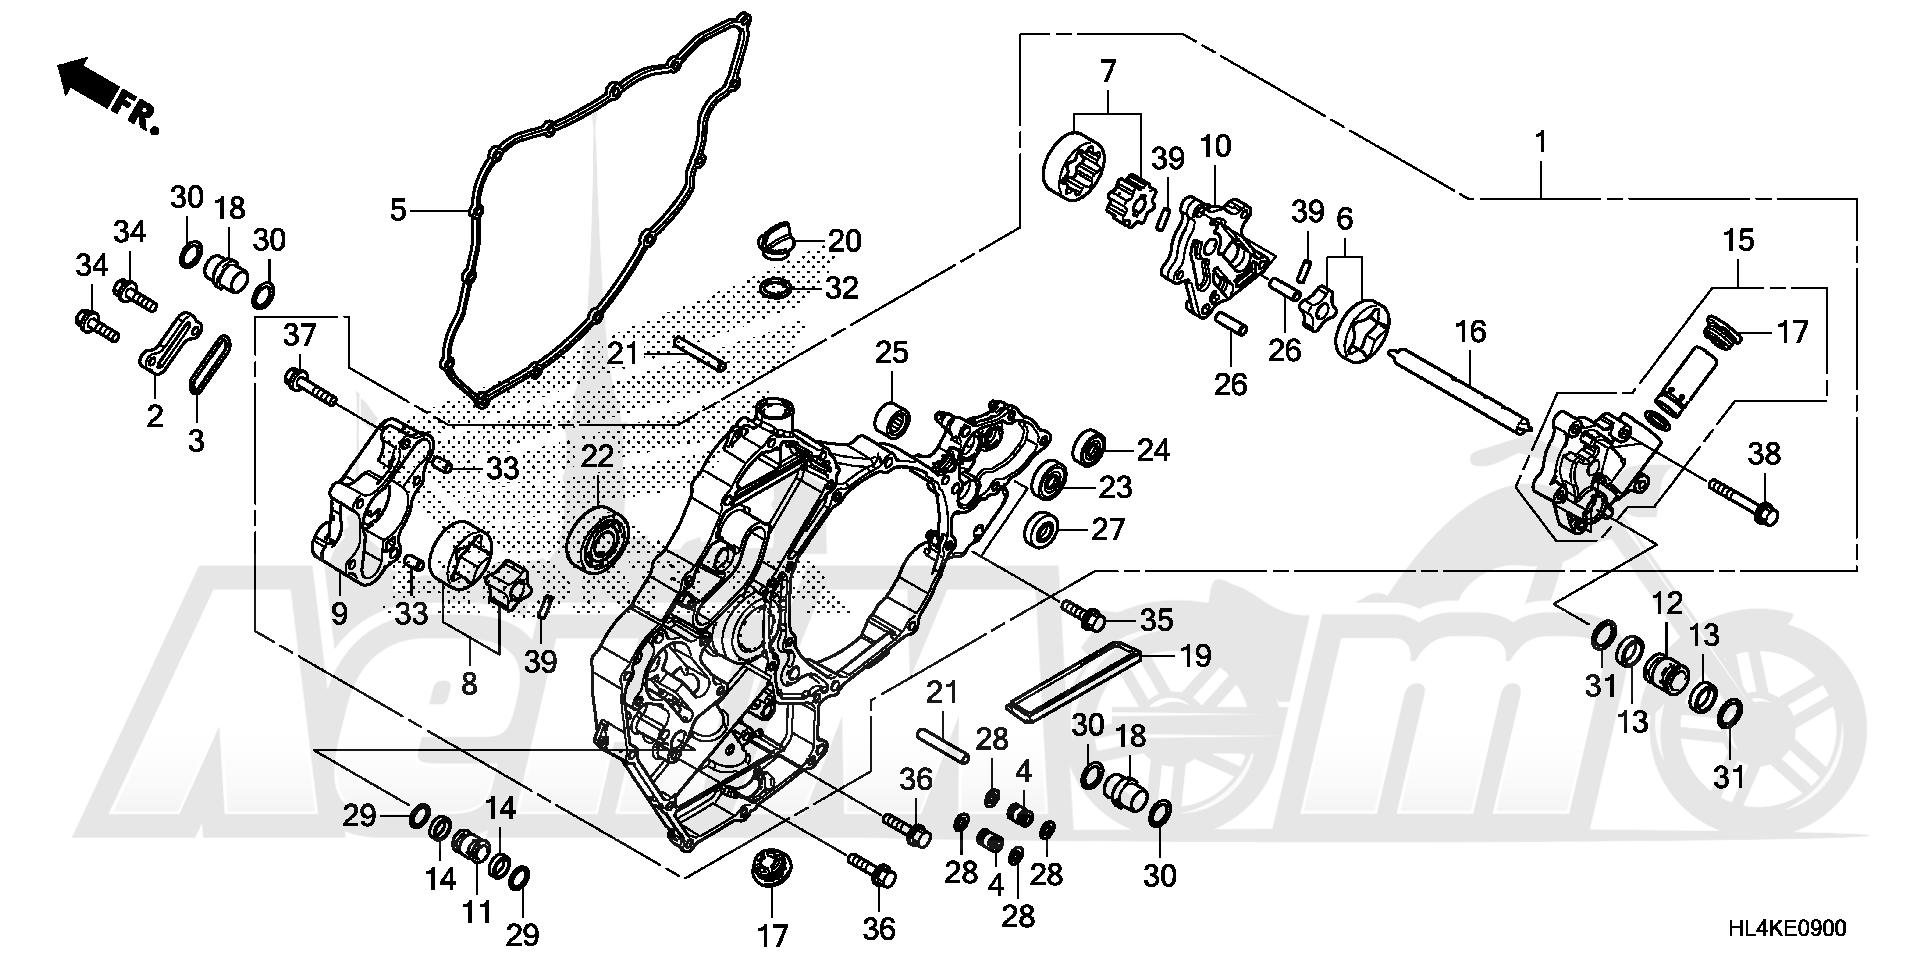 Запчасти для Квадроцикла Honda 2019 SXS1000M5P Раздел: OIL PUMP | маслянный насос